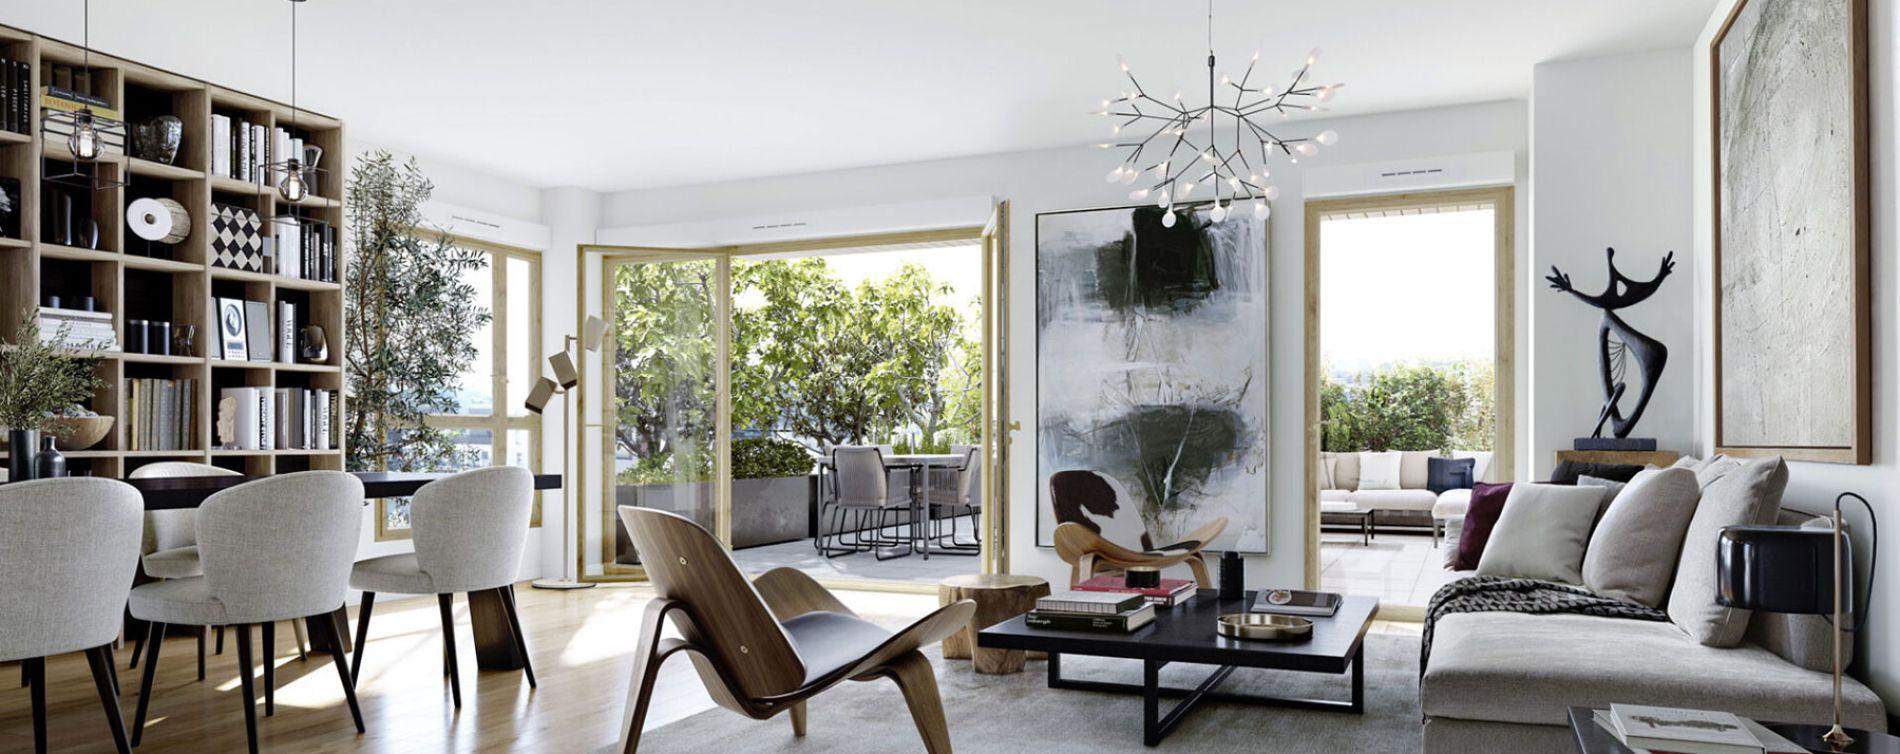 Rueil-Malmaison : programme immobilier neuve « Programme immobilier n°218735 » (5)